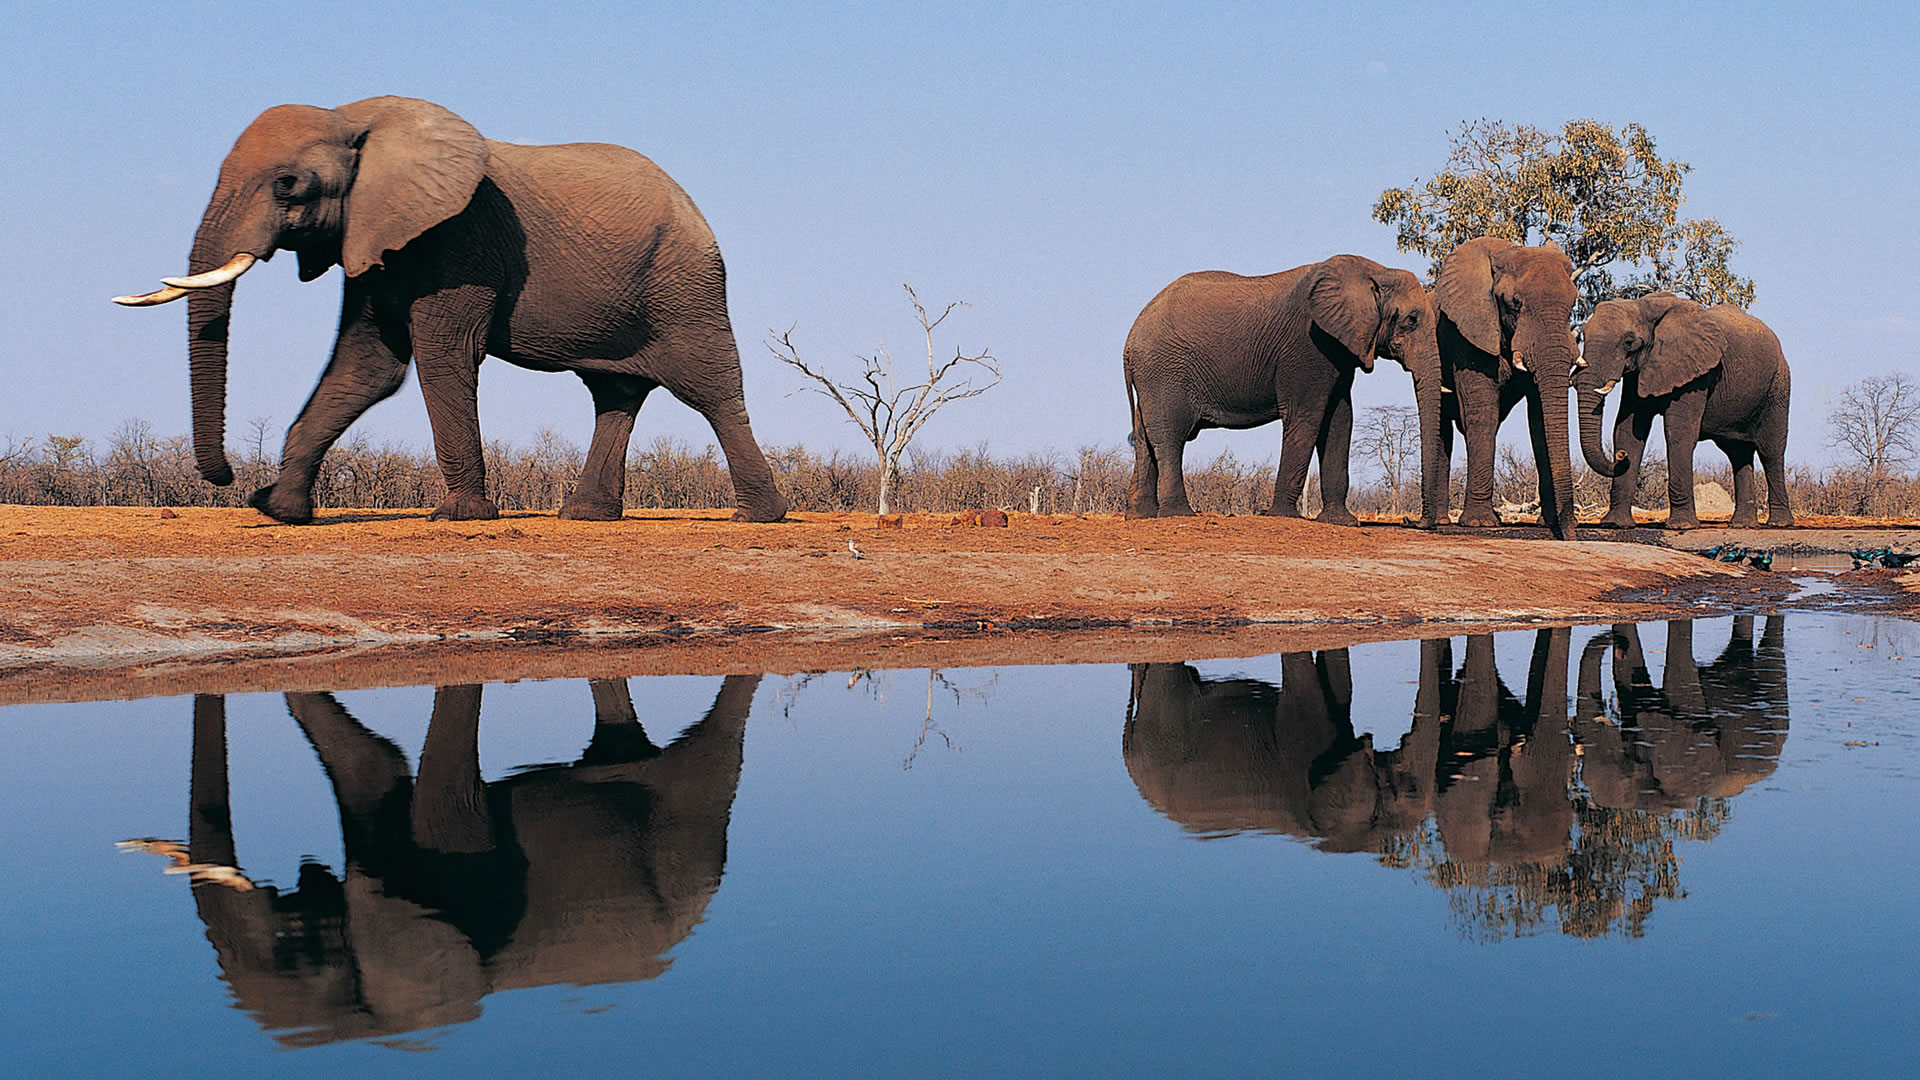 Download Wallpaper Cartoon Elephant - cartoon-elephant-desktop-509801  Picture_503425  .jpg